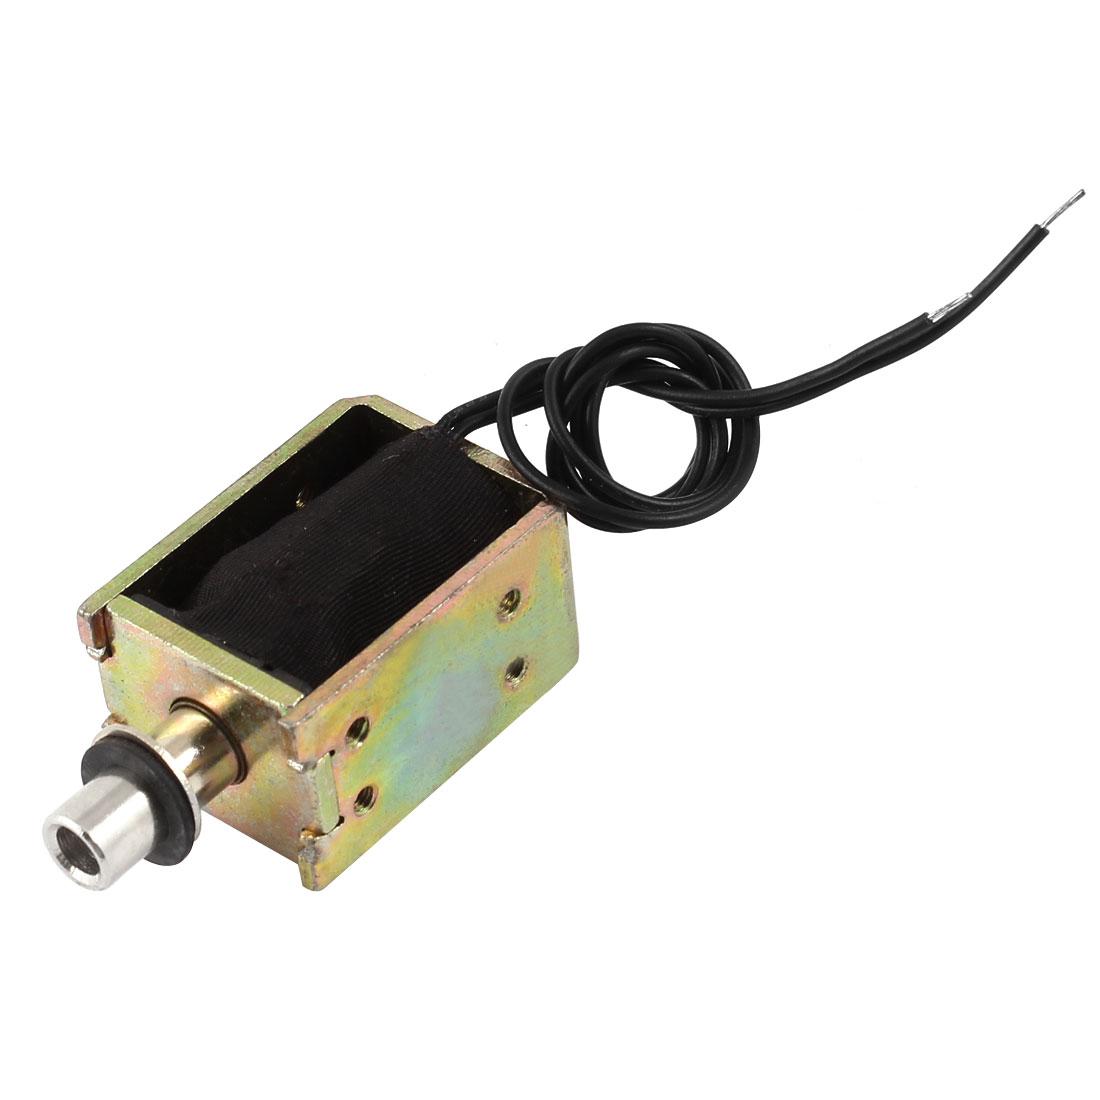 4mm Stroke 0.12Kg Holding Force Push Pull Type Solenoid Electromagnet DC 12V